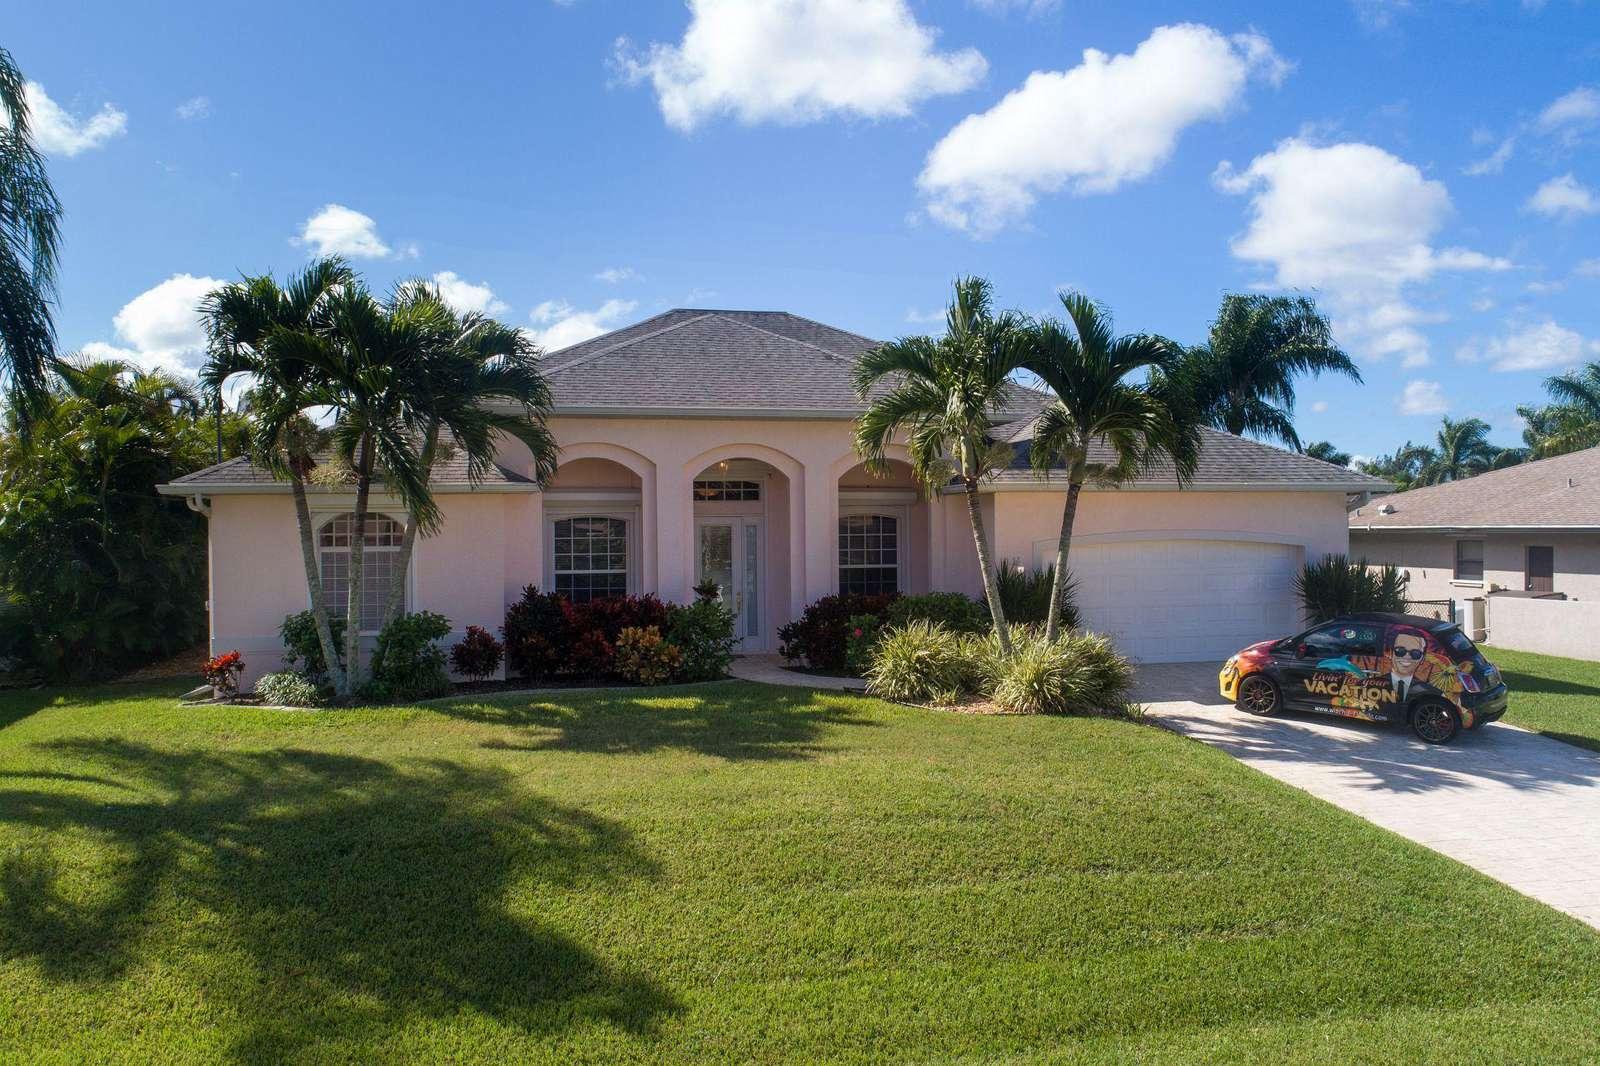 Wischis Florida Home - Tropical Lagoon